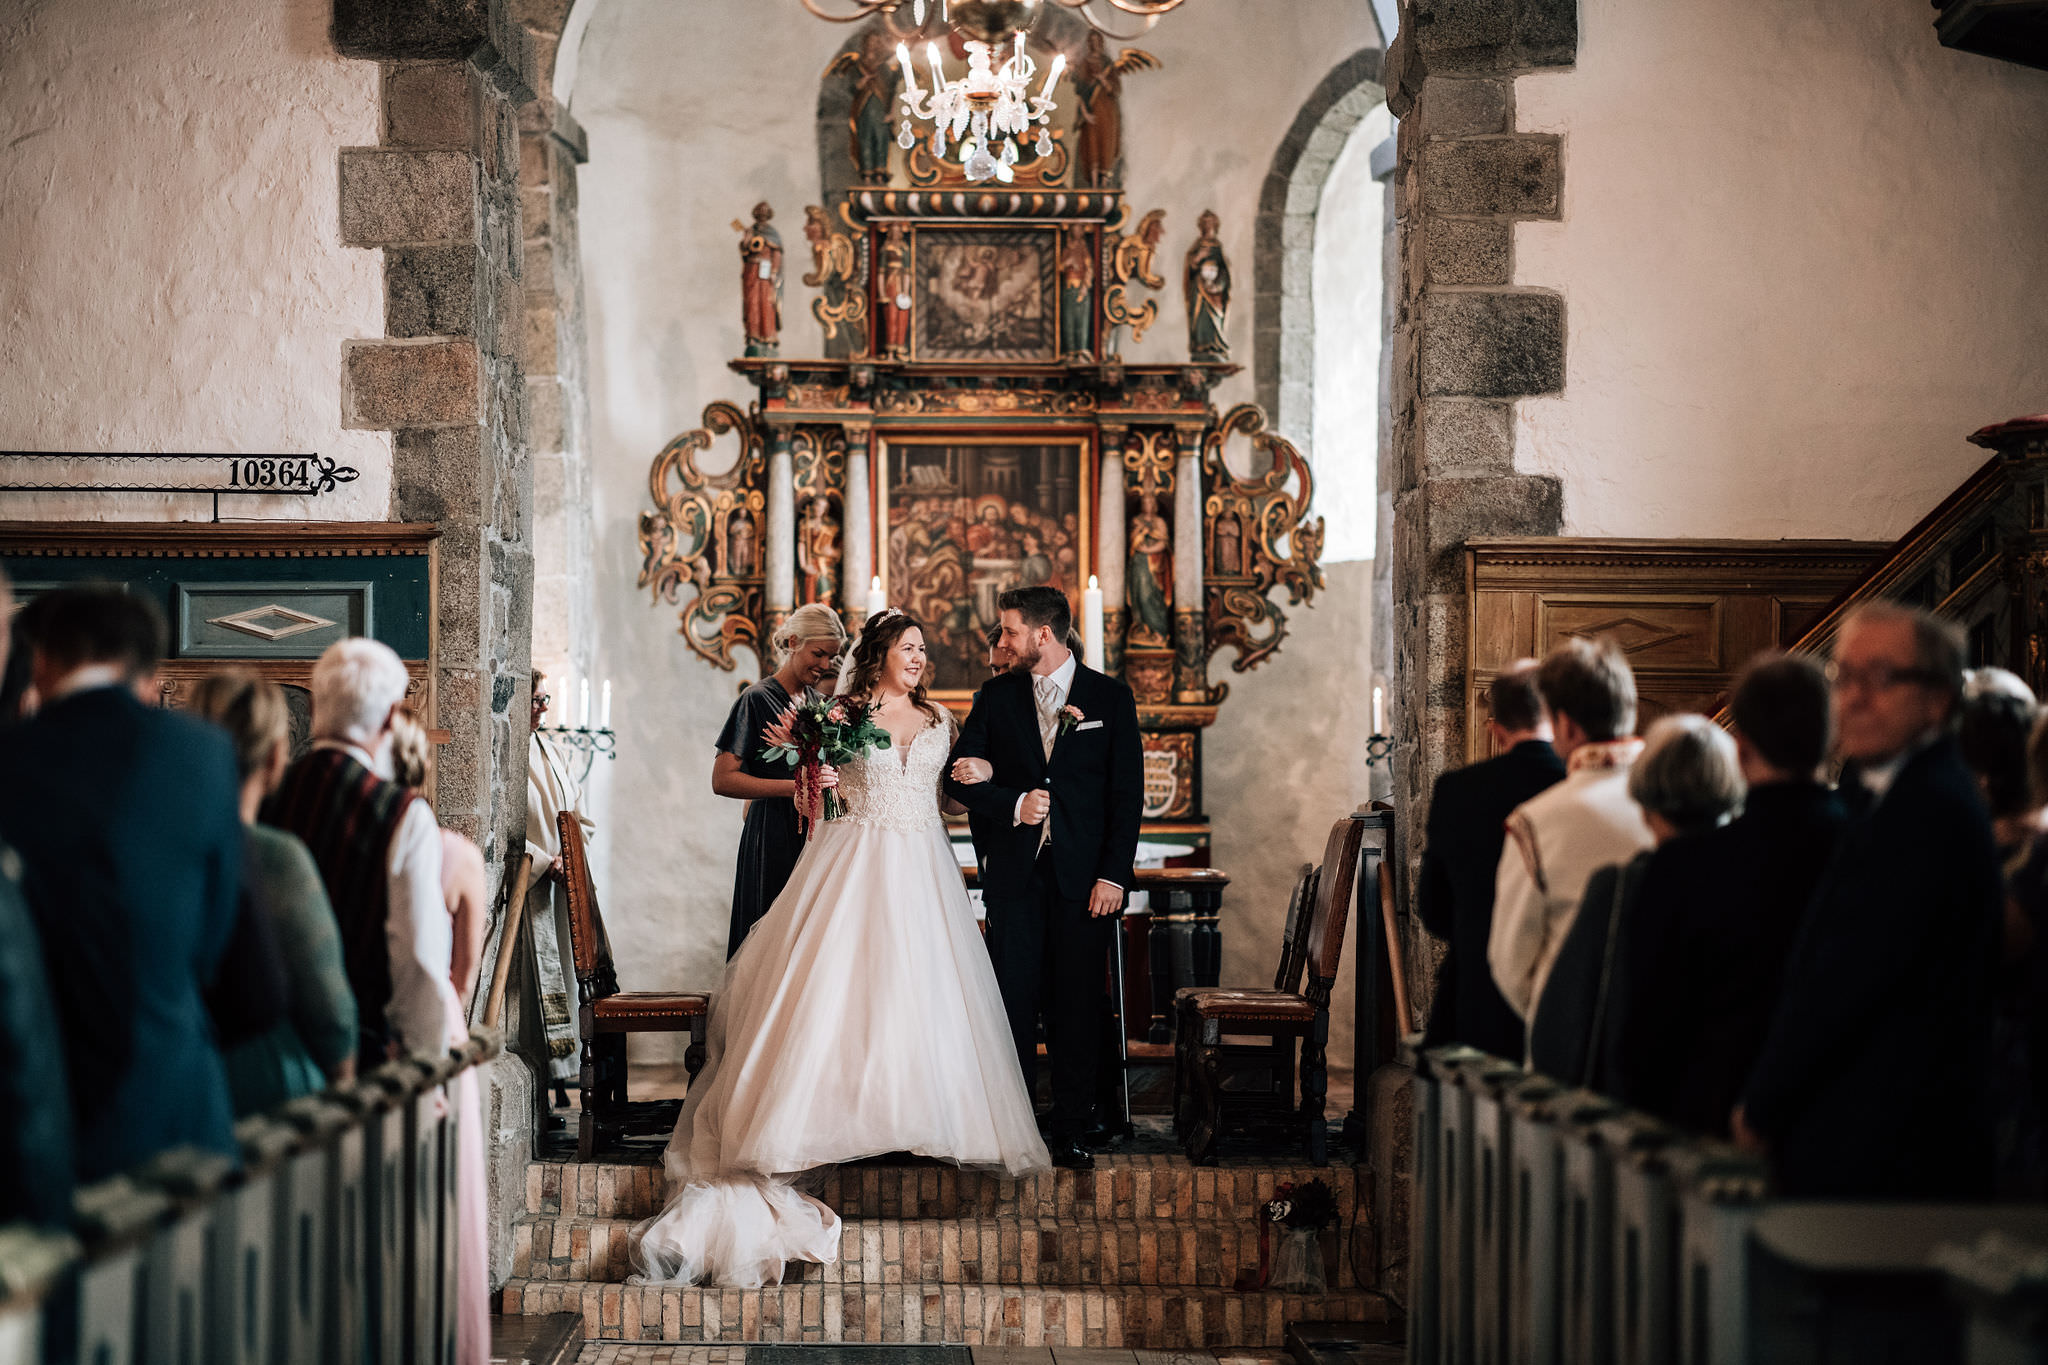 _N857744_fotografering_larvik_bryllup_aspargesgarden_.jpg